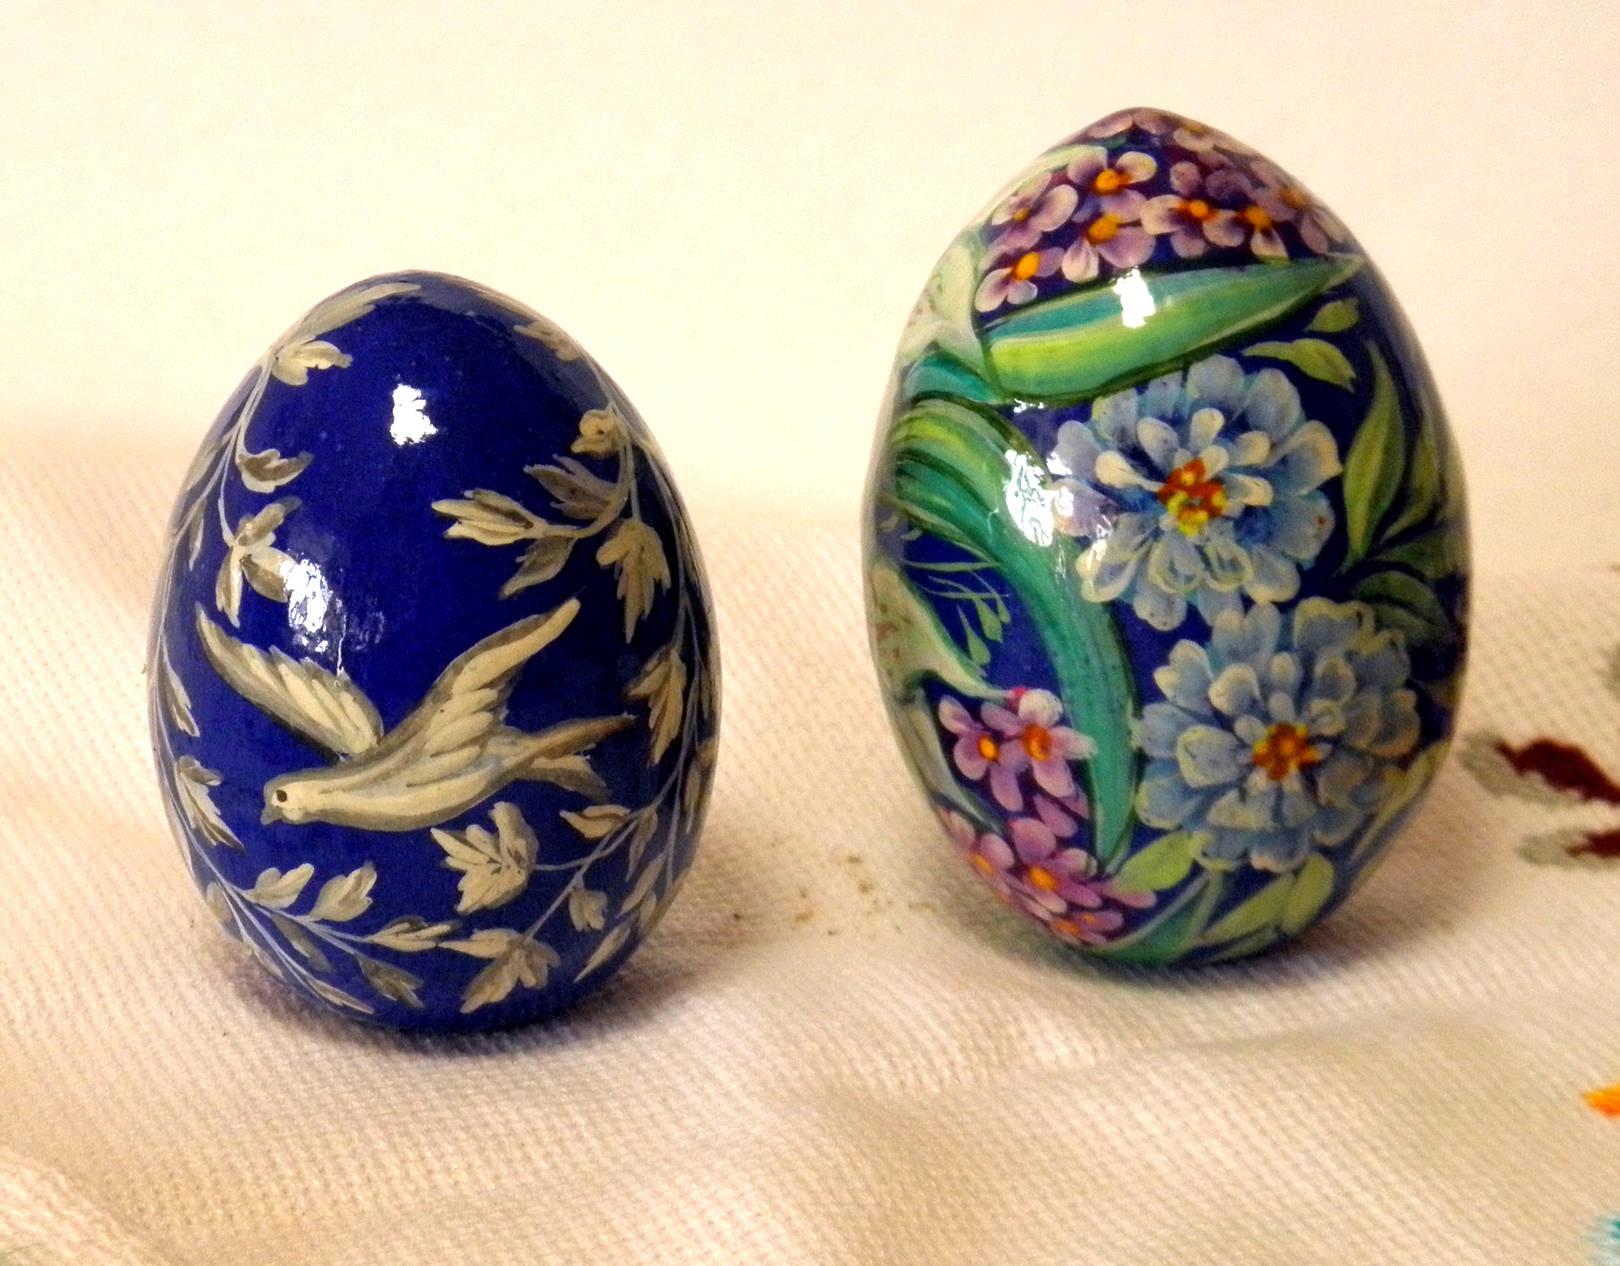 Яйца ( the eggs )